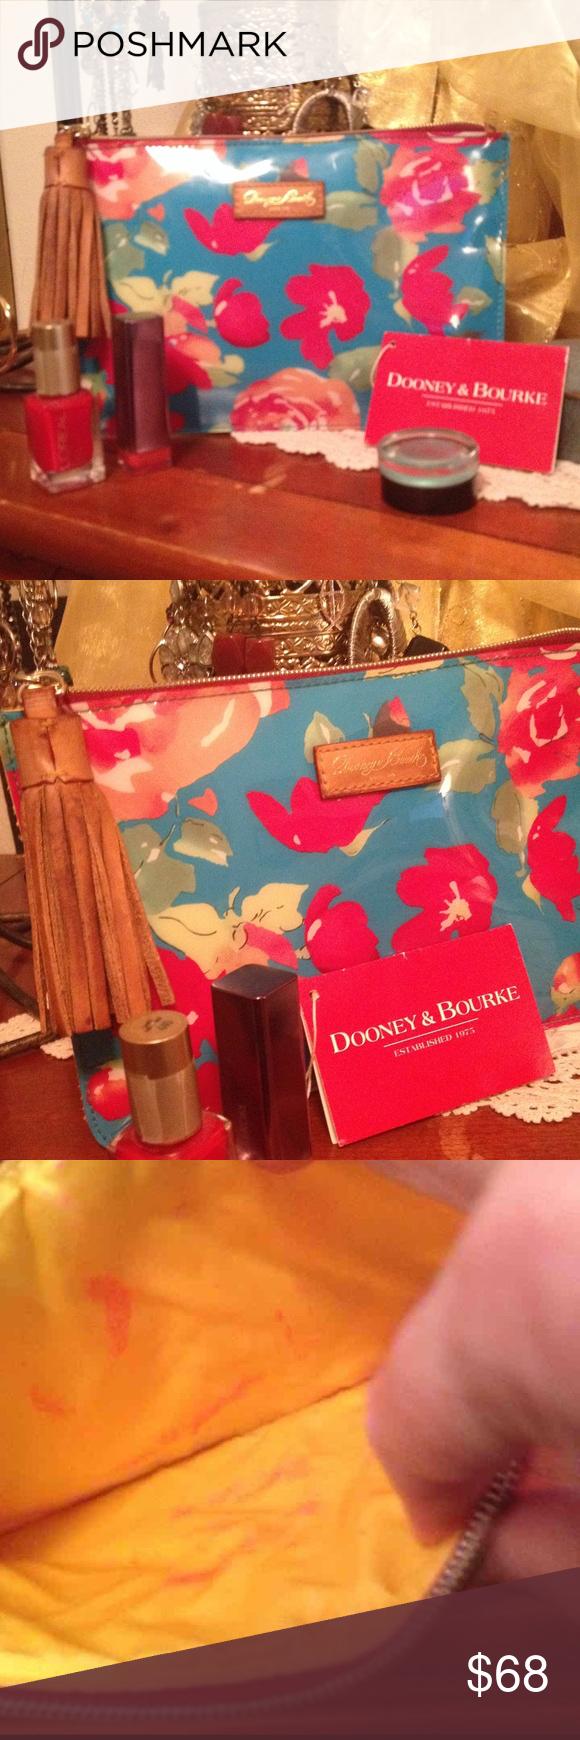 Dooney & Bourke Large Floral Rose Cosmetic Bag💄💋 Dooney